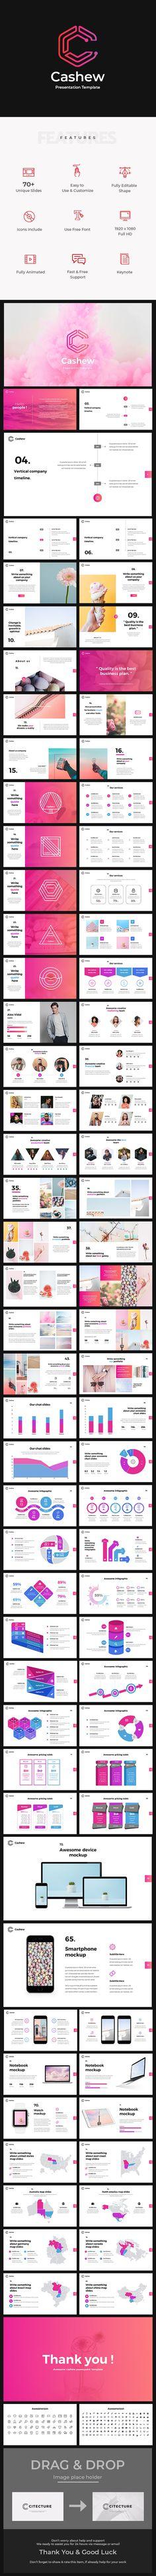 Cashew Creative PowerPoint Presentation Template - 100 Total Slides